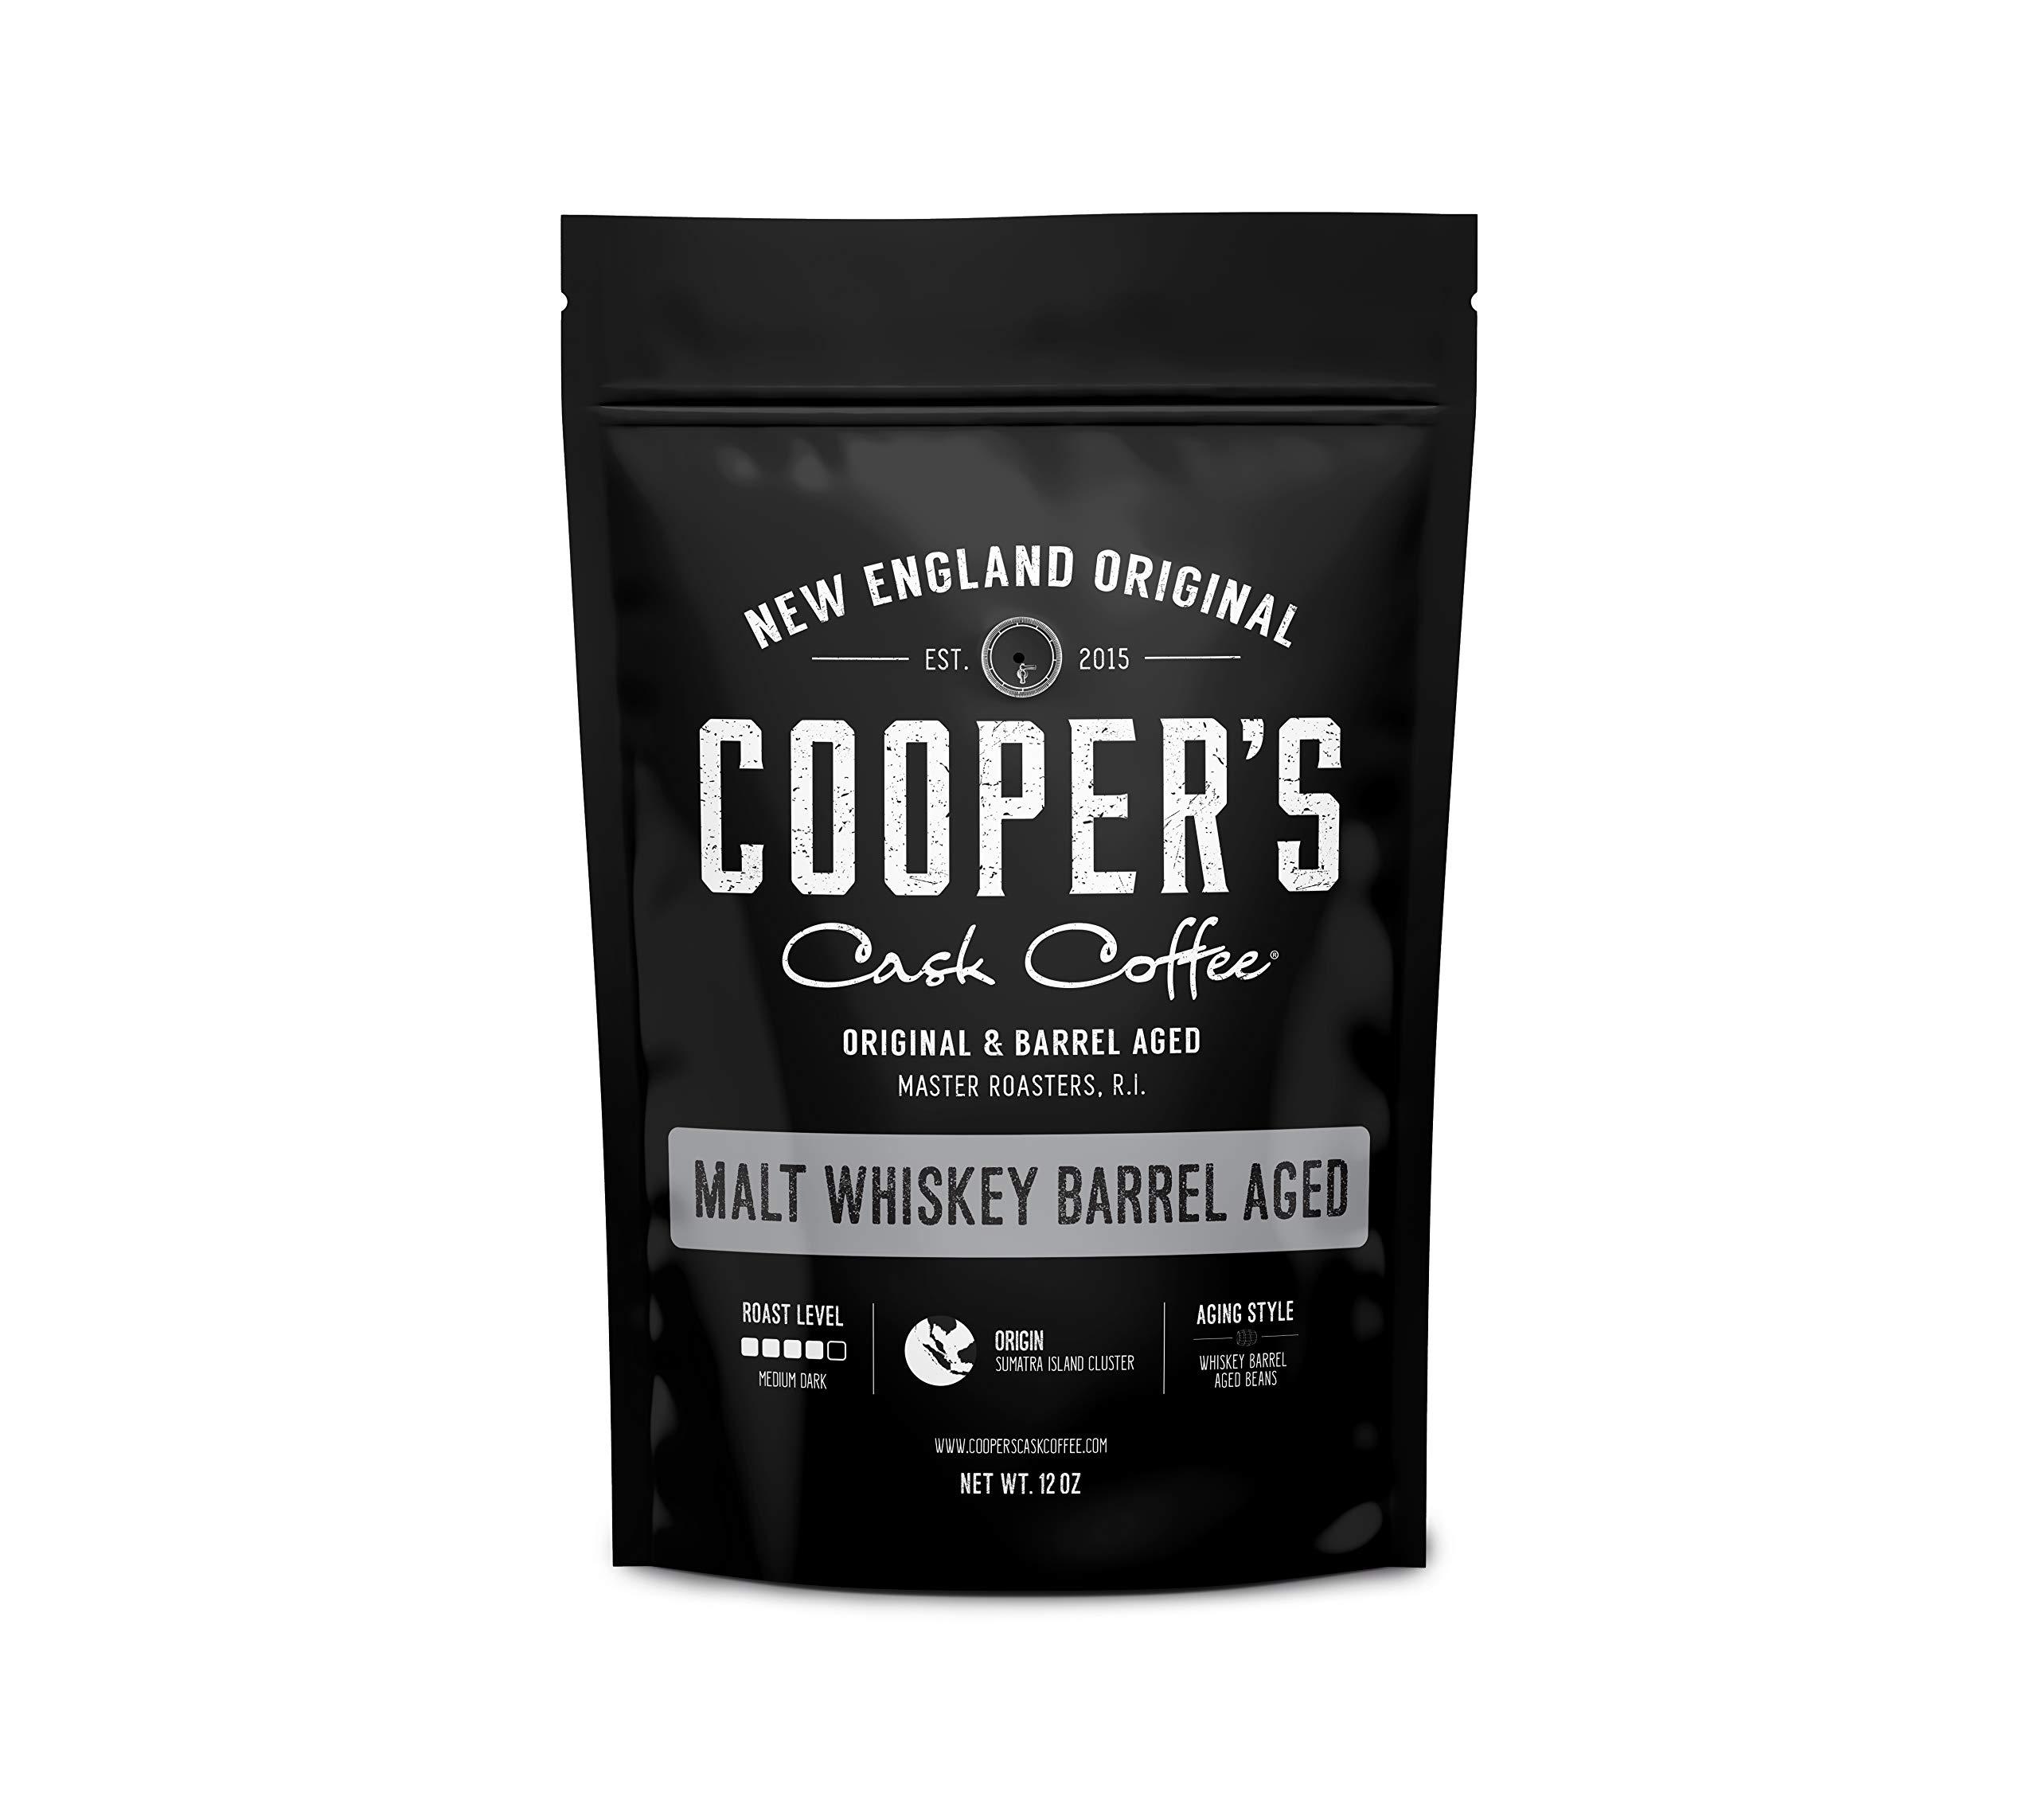 Single-Malt Whiskey Barrel Aged Coffee - Single Origin Sumatra Coffee Beans Aged in Stout Whiskey Barrels - UPRISING- 12 oz Bags, Whole Coffee Bean